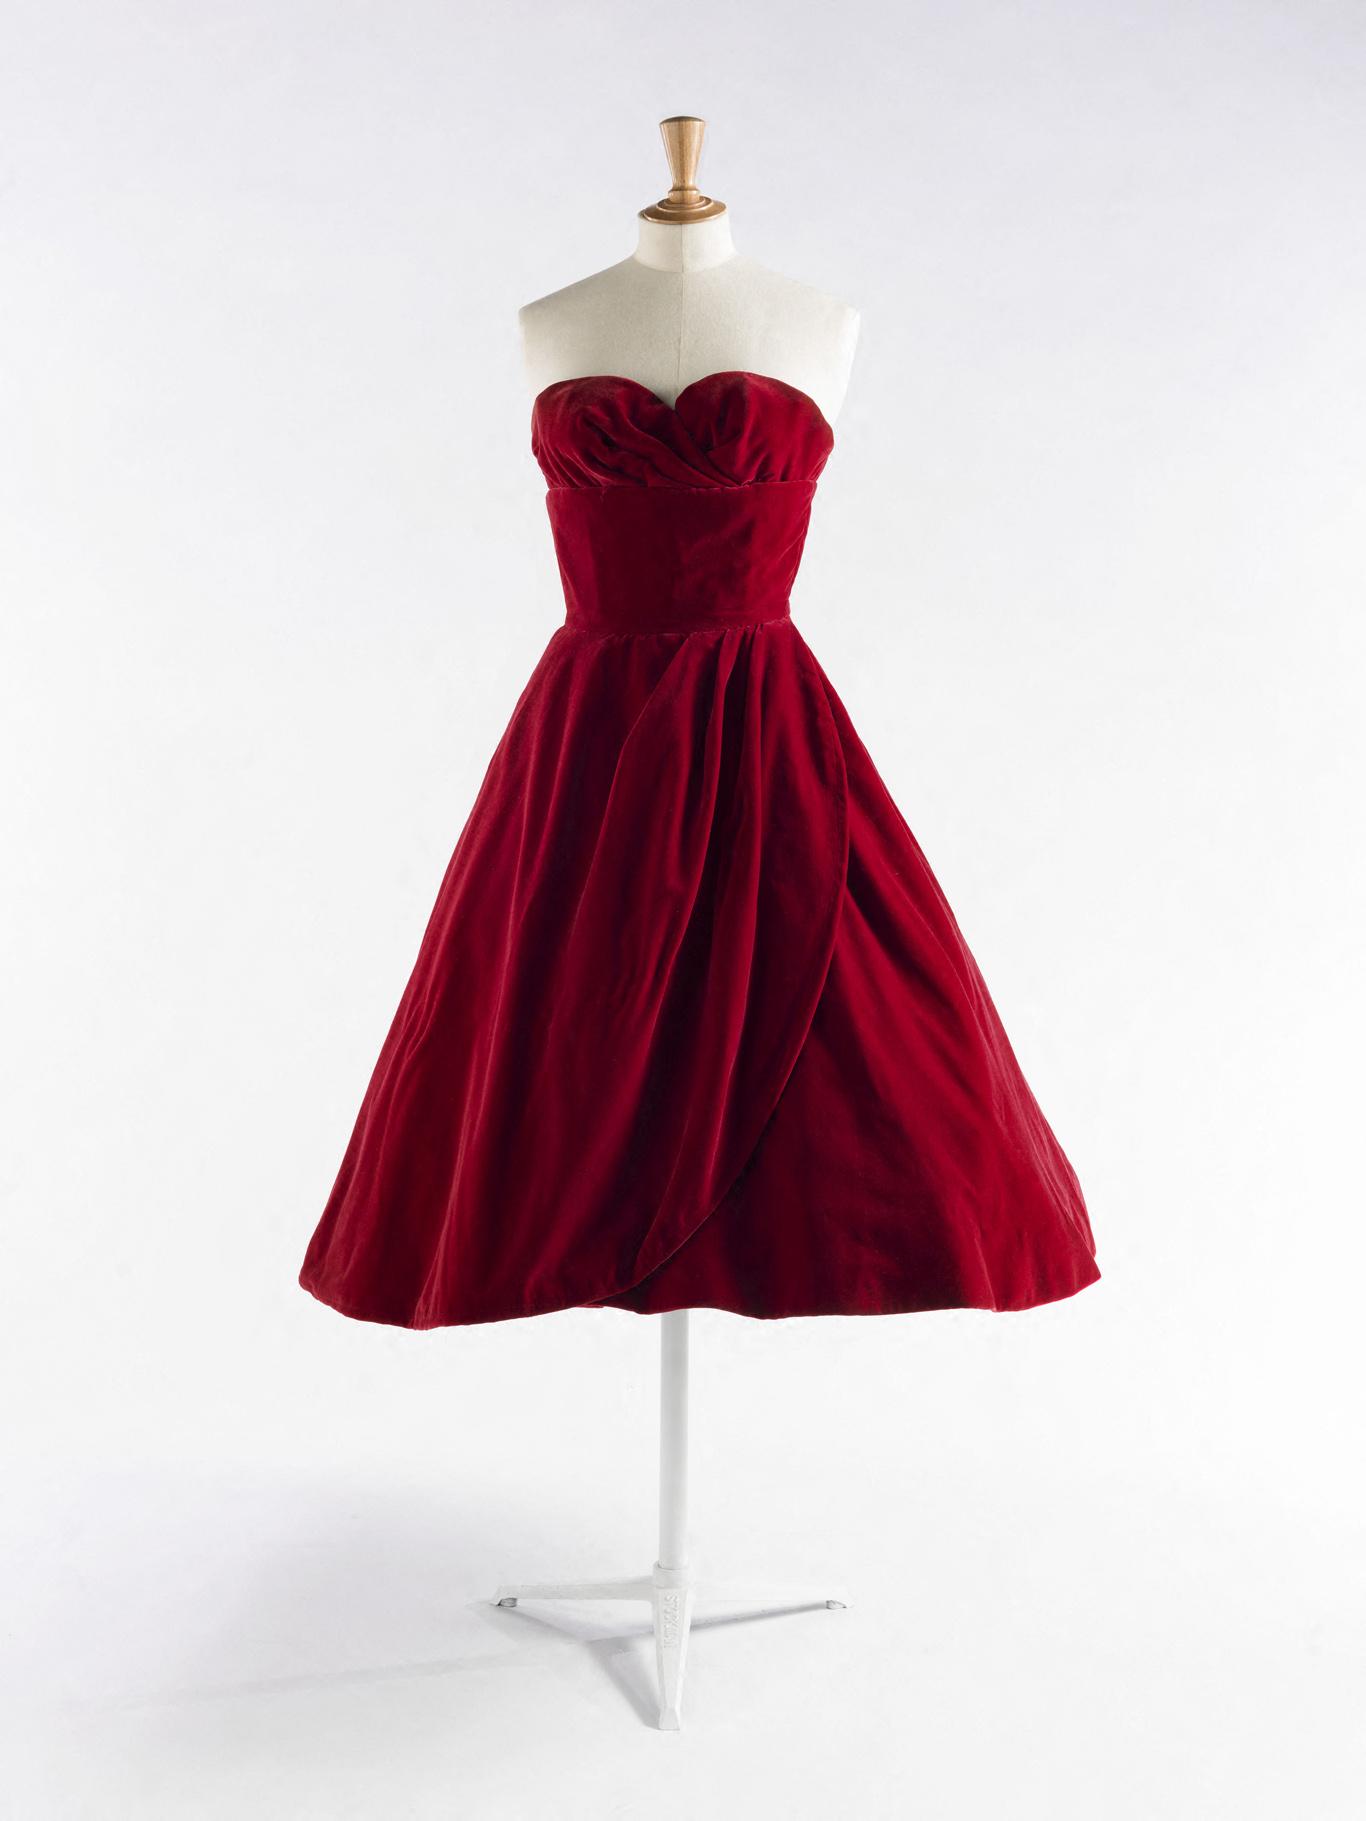 An item from Dalida's wardrobe on exhibition at Palais Galleria